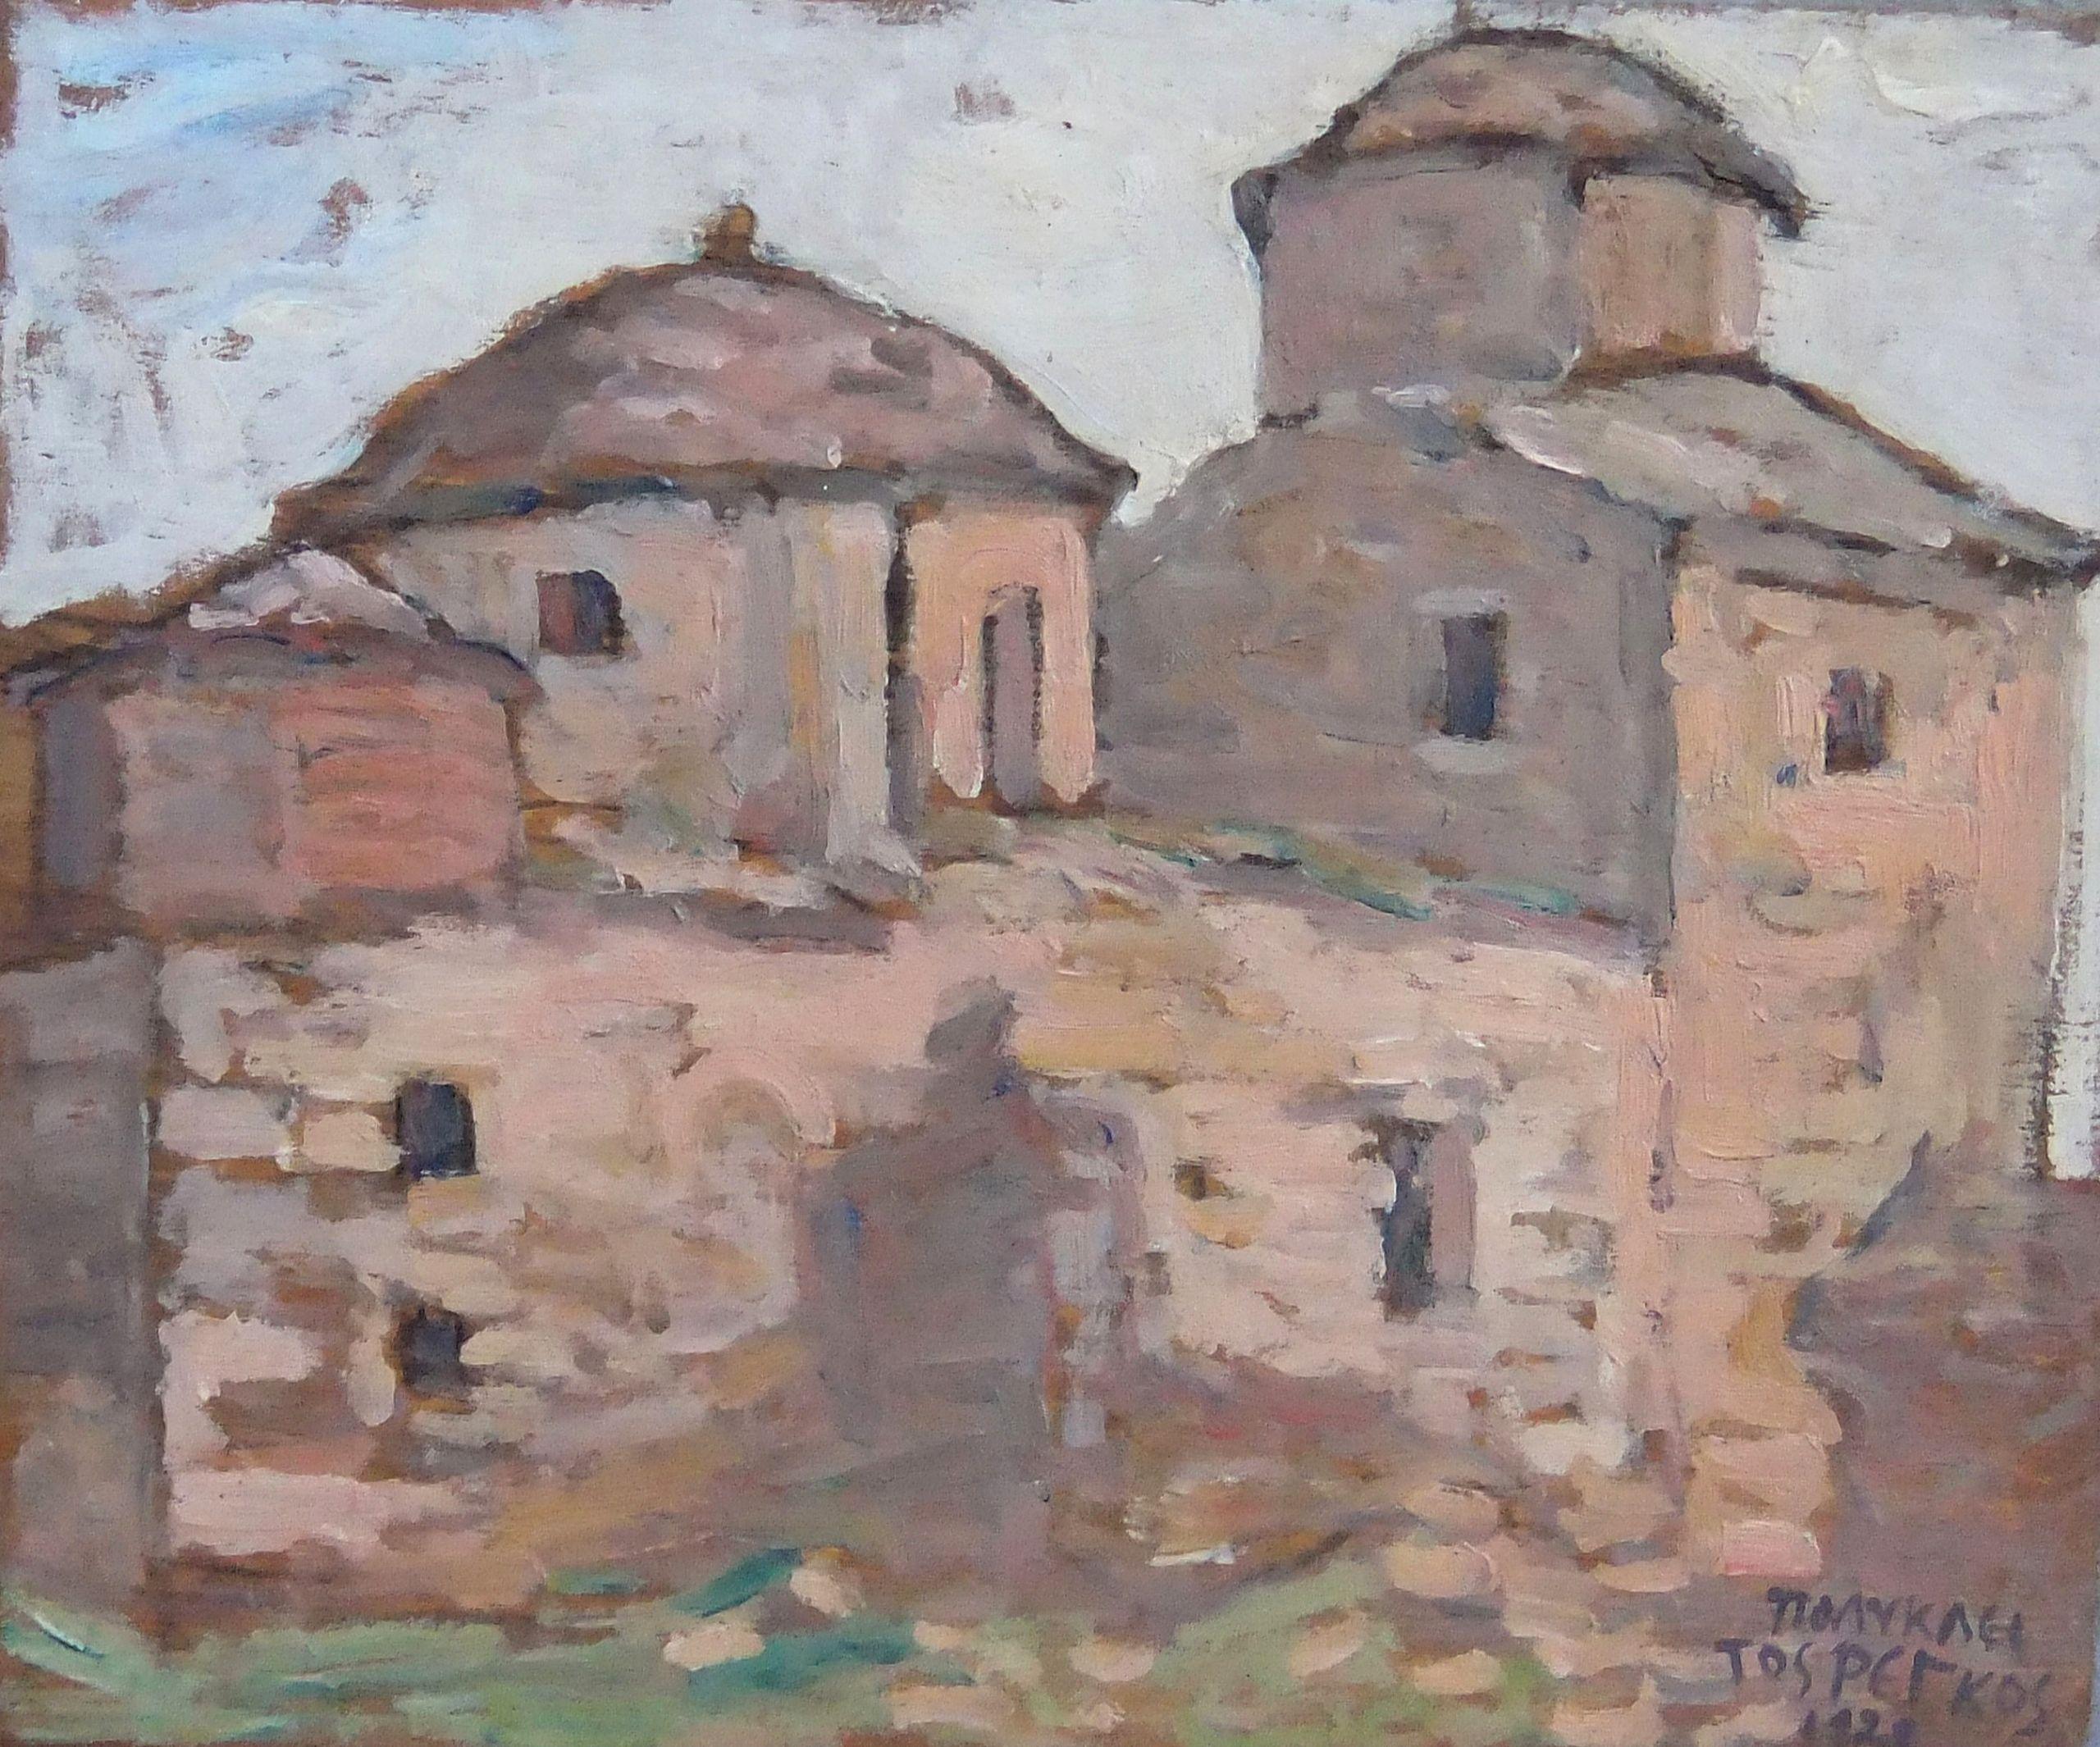 11. RENGOS Polyklitos (1903 - 1984)